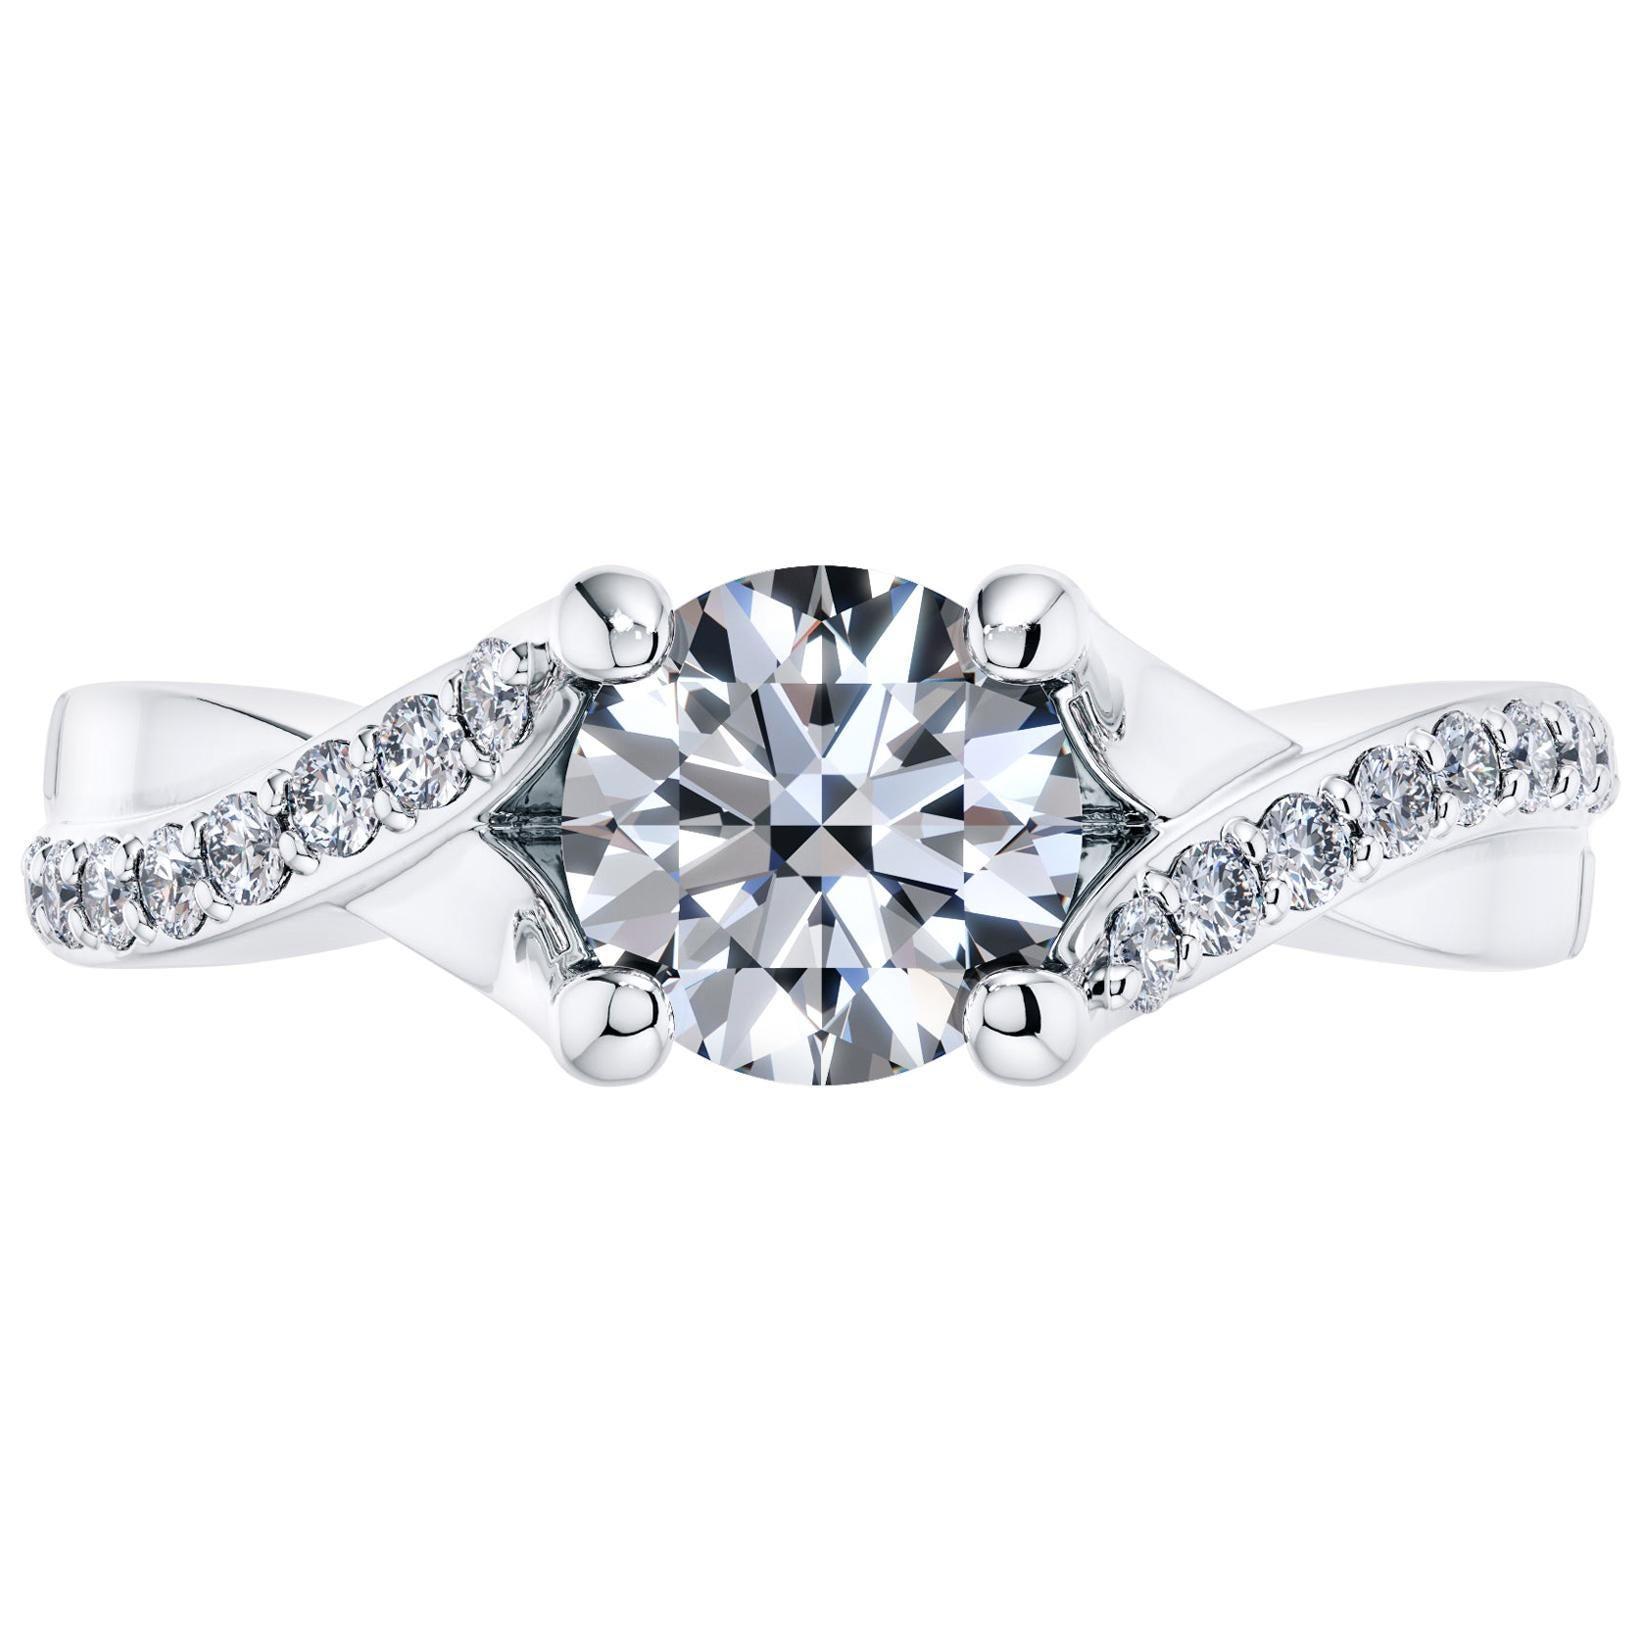 Platinum Engagement 0.82 Carat Round Diamond Bespoke Fancy Twist 4 Prong Ring